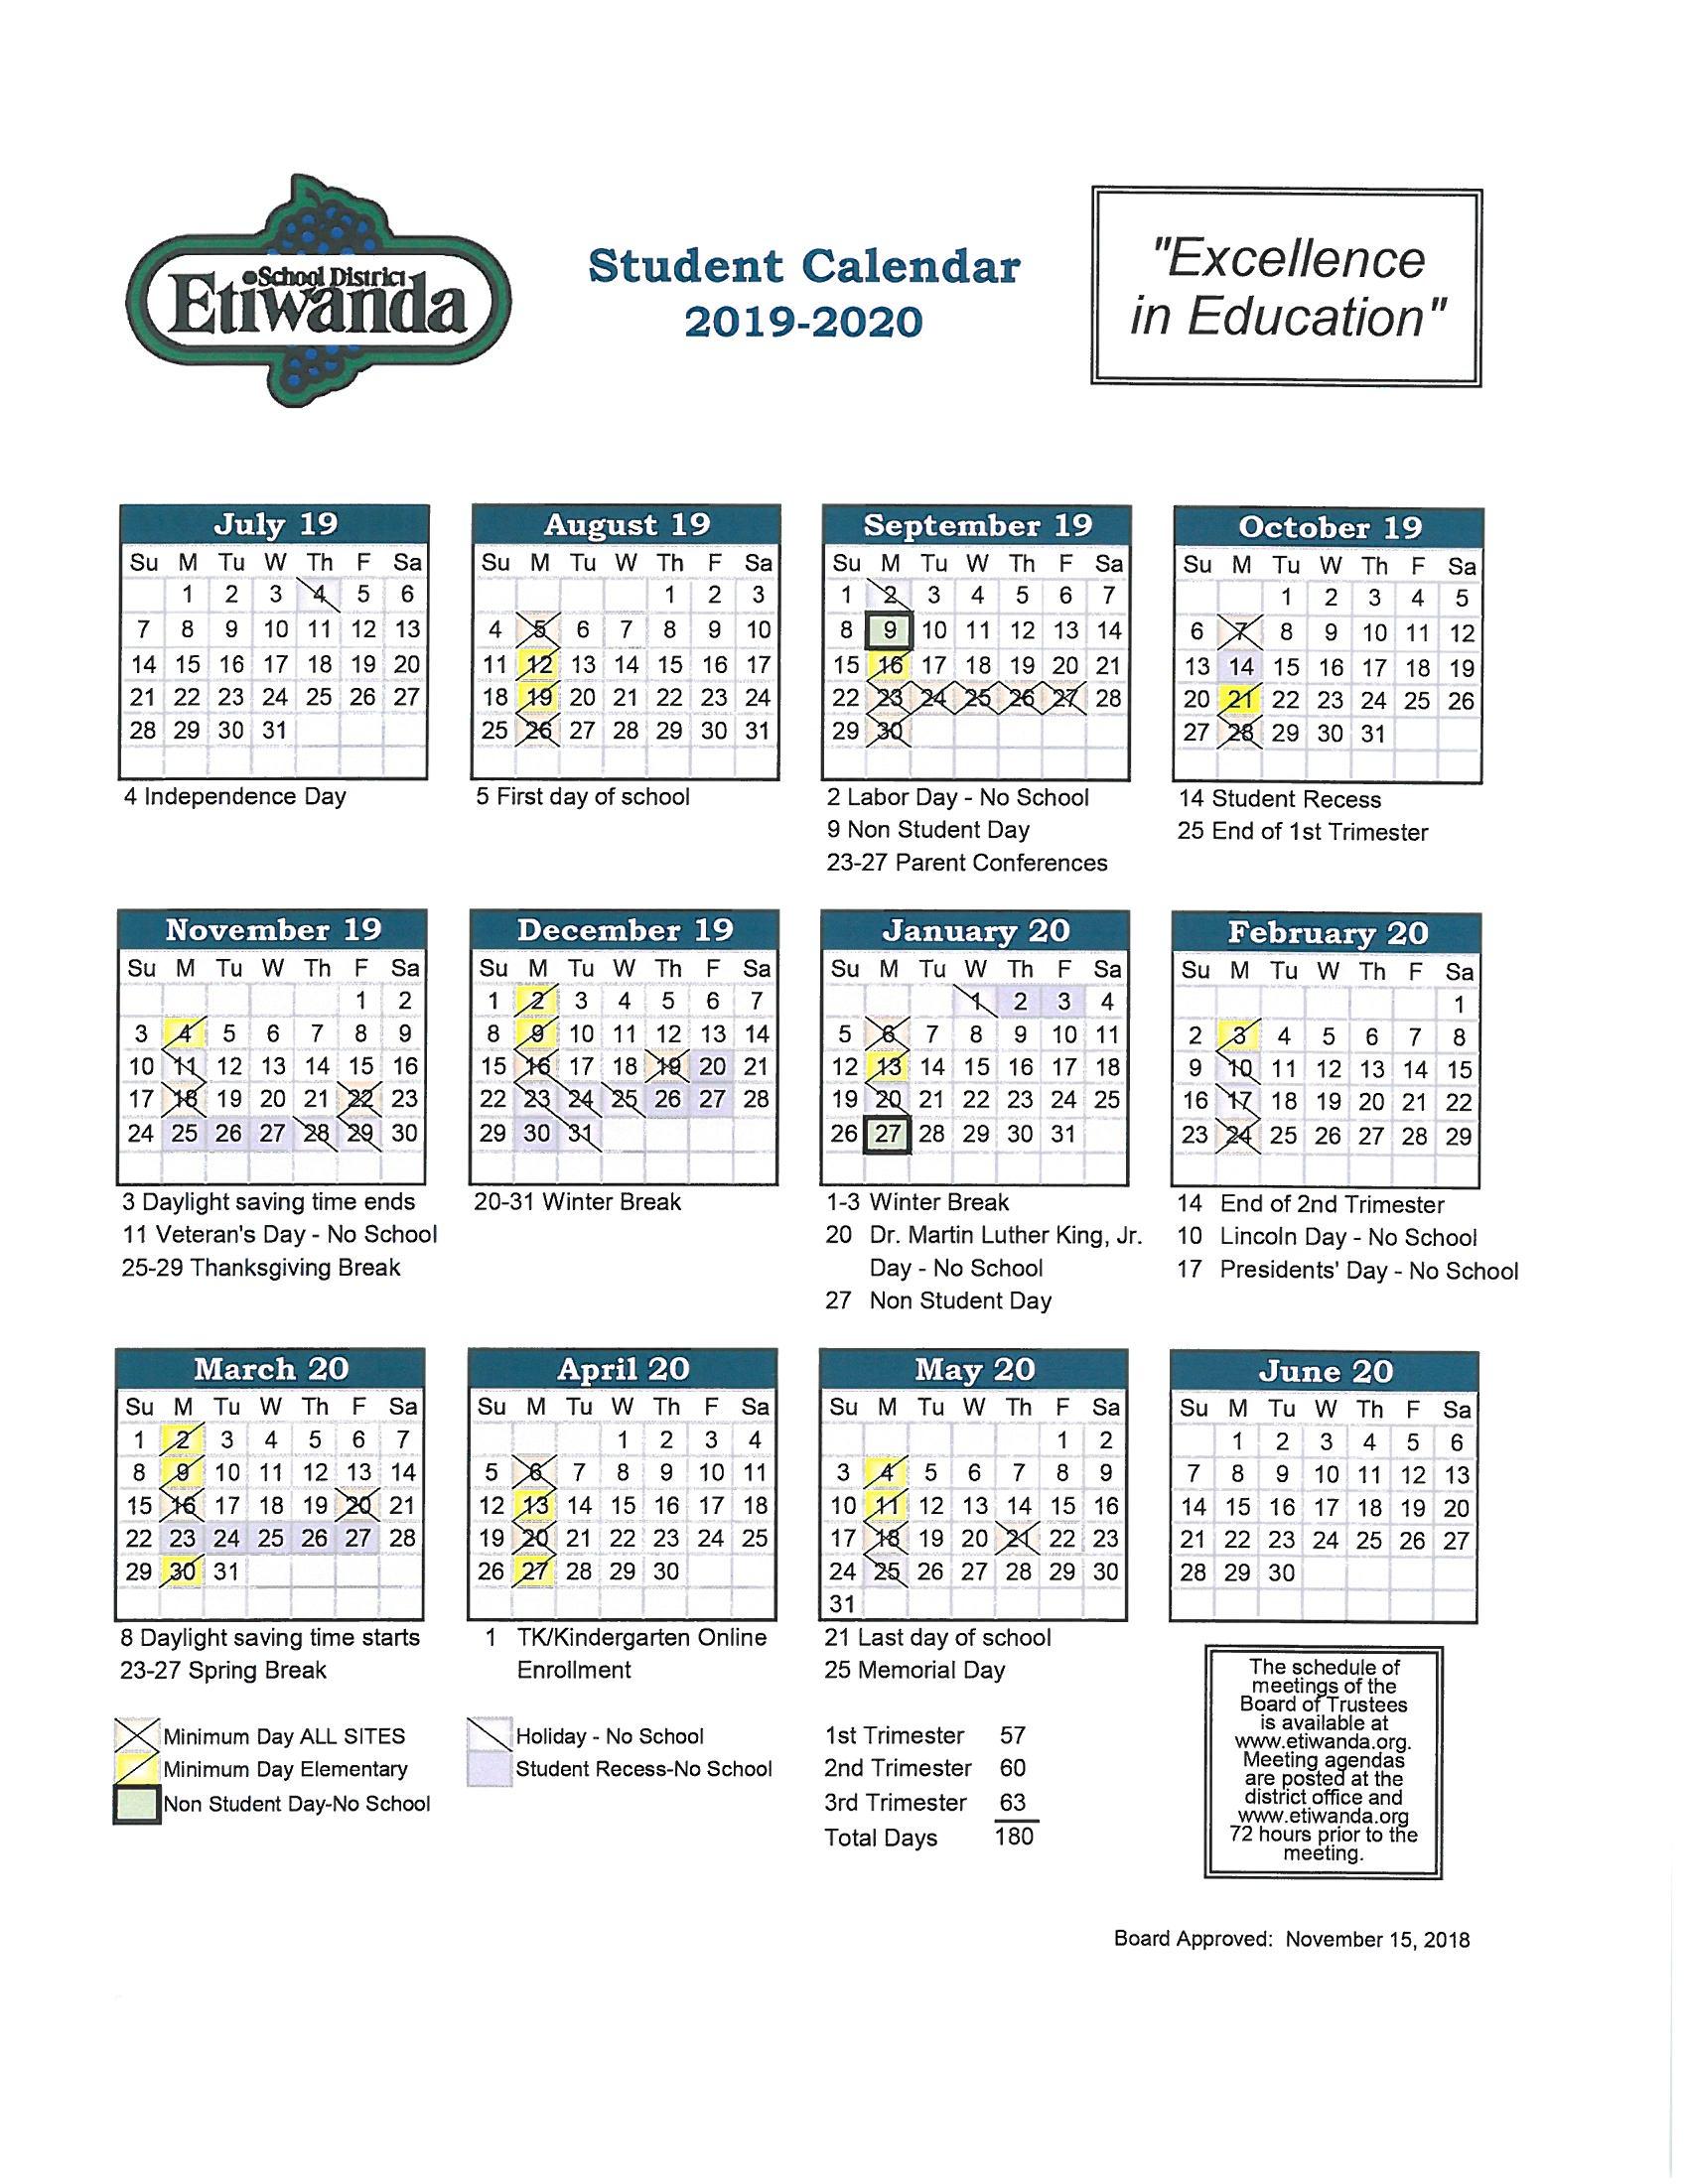 University Of Southern California School Calendar 2021 Inside Uri School Calendar 2021 2020